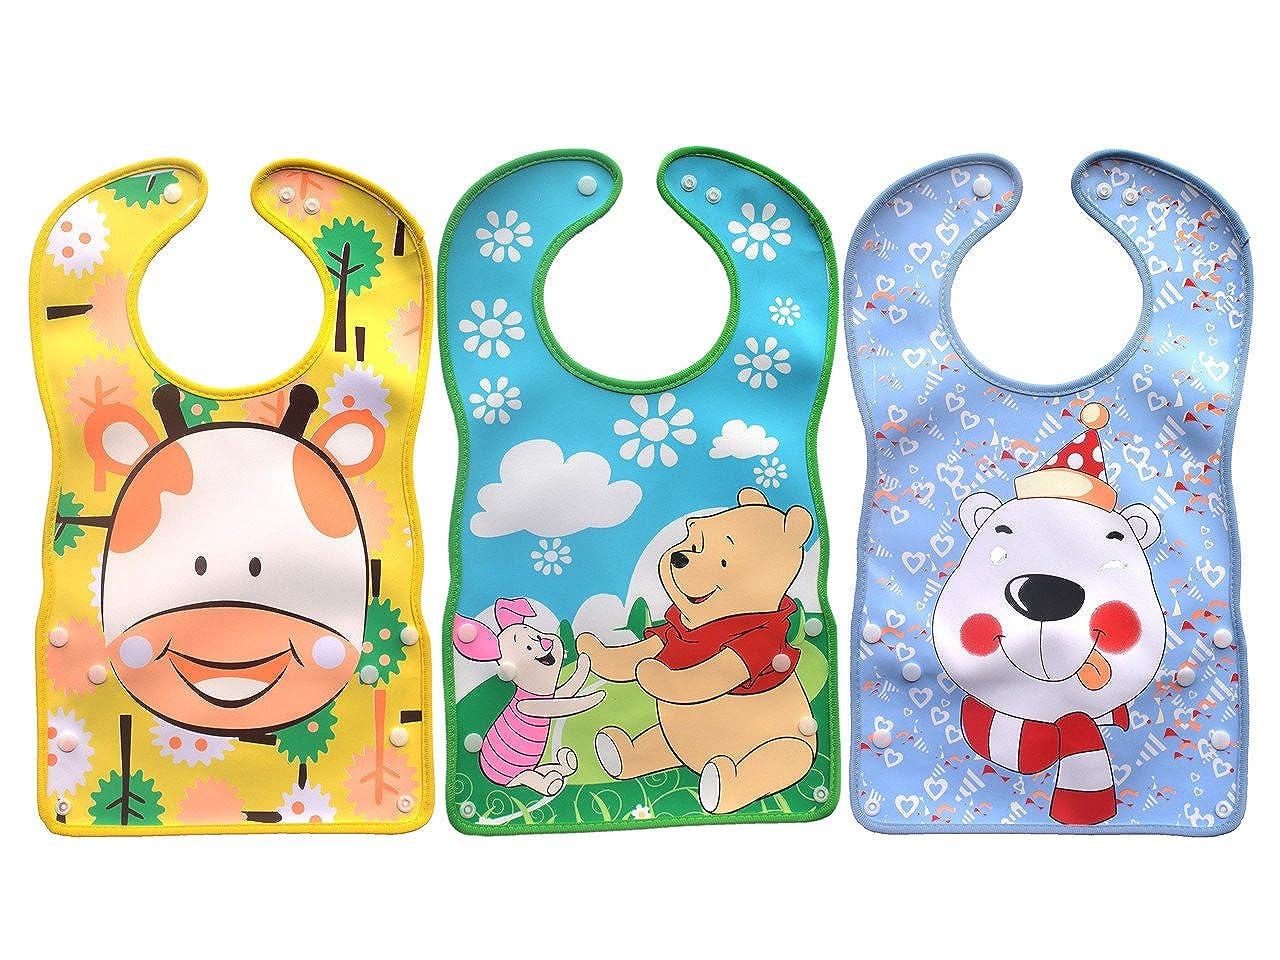 Baby Waterproof Stereo Soft Bib Sets 3pcs/6 Months-3 Years Smart Kids SK-061